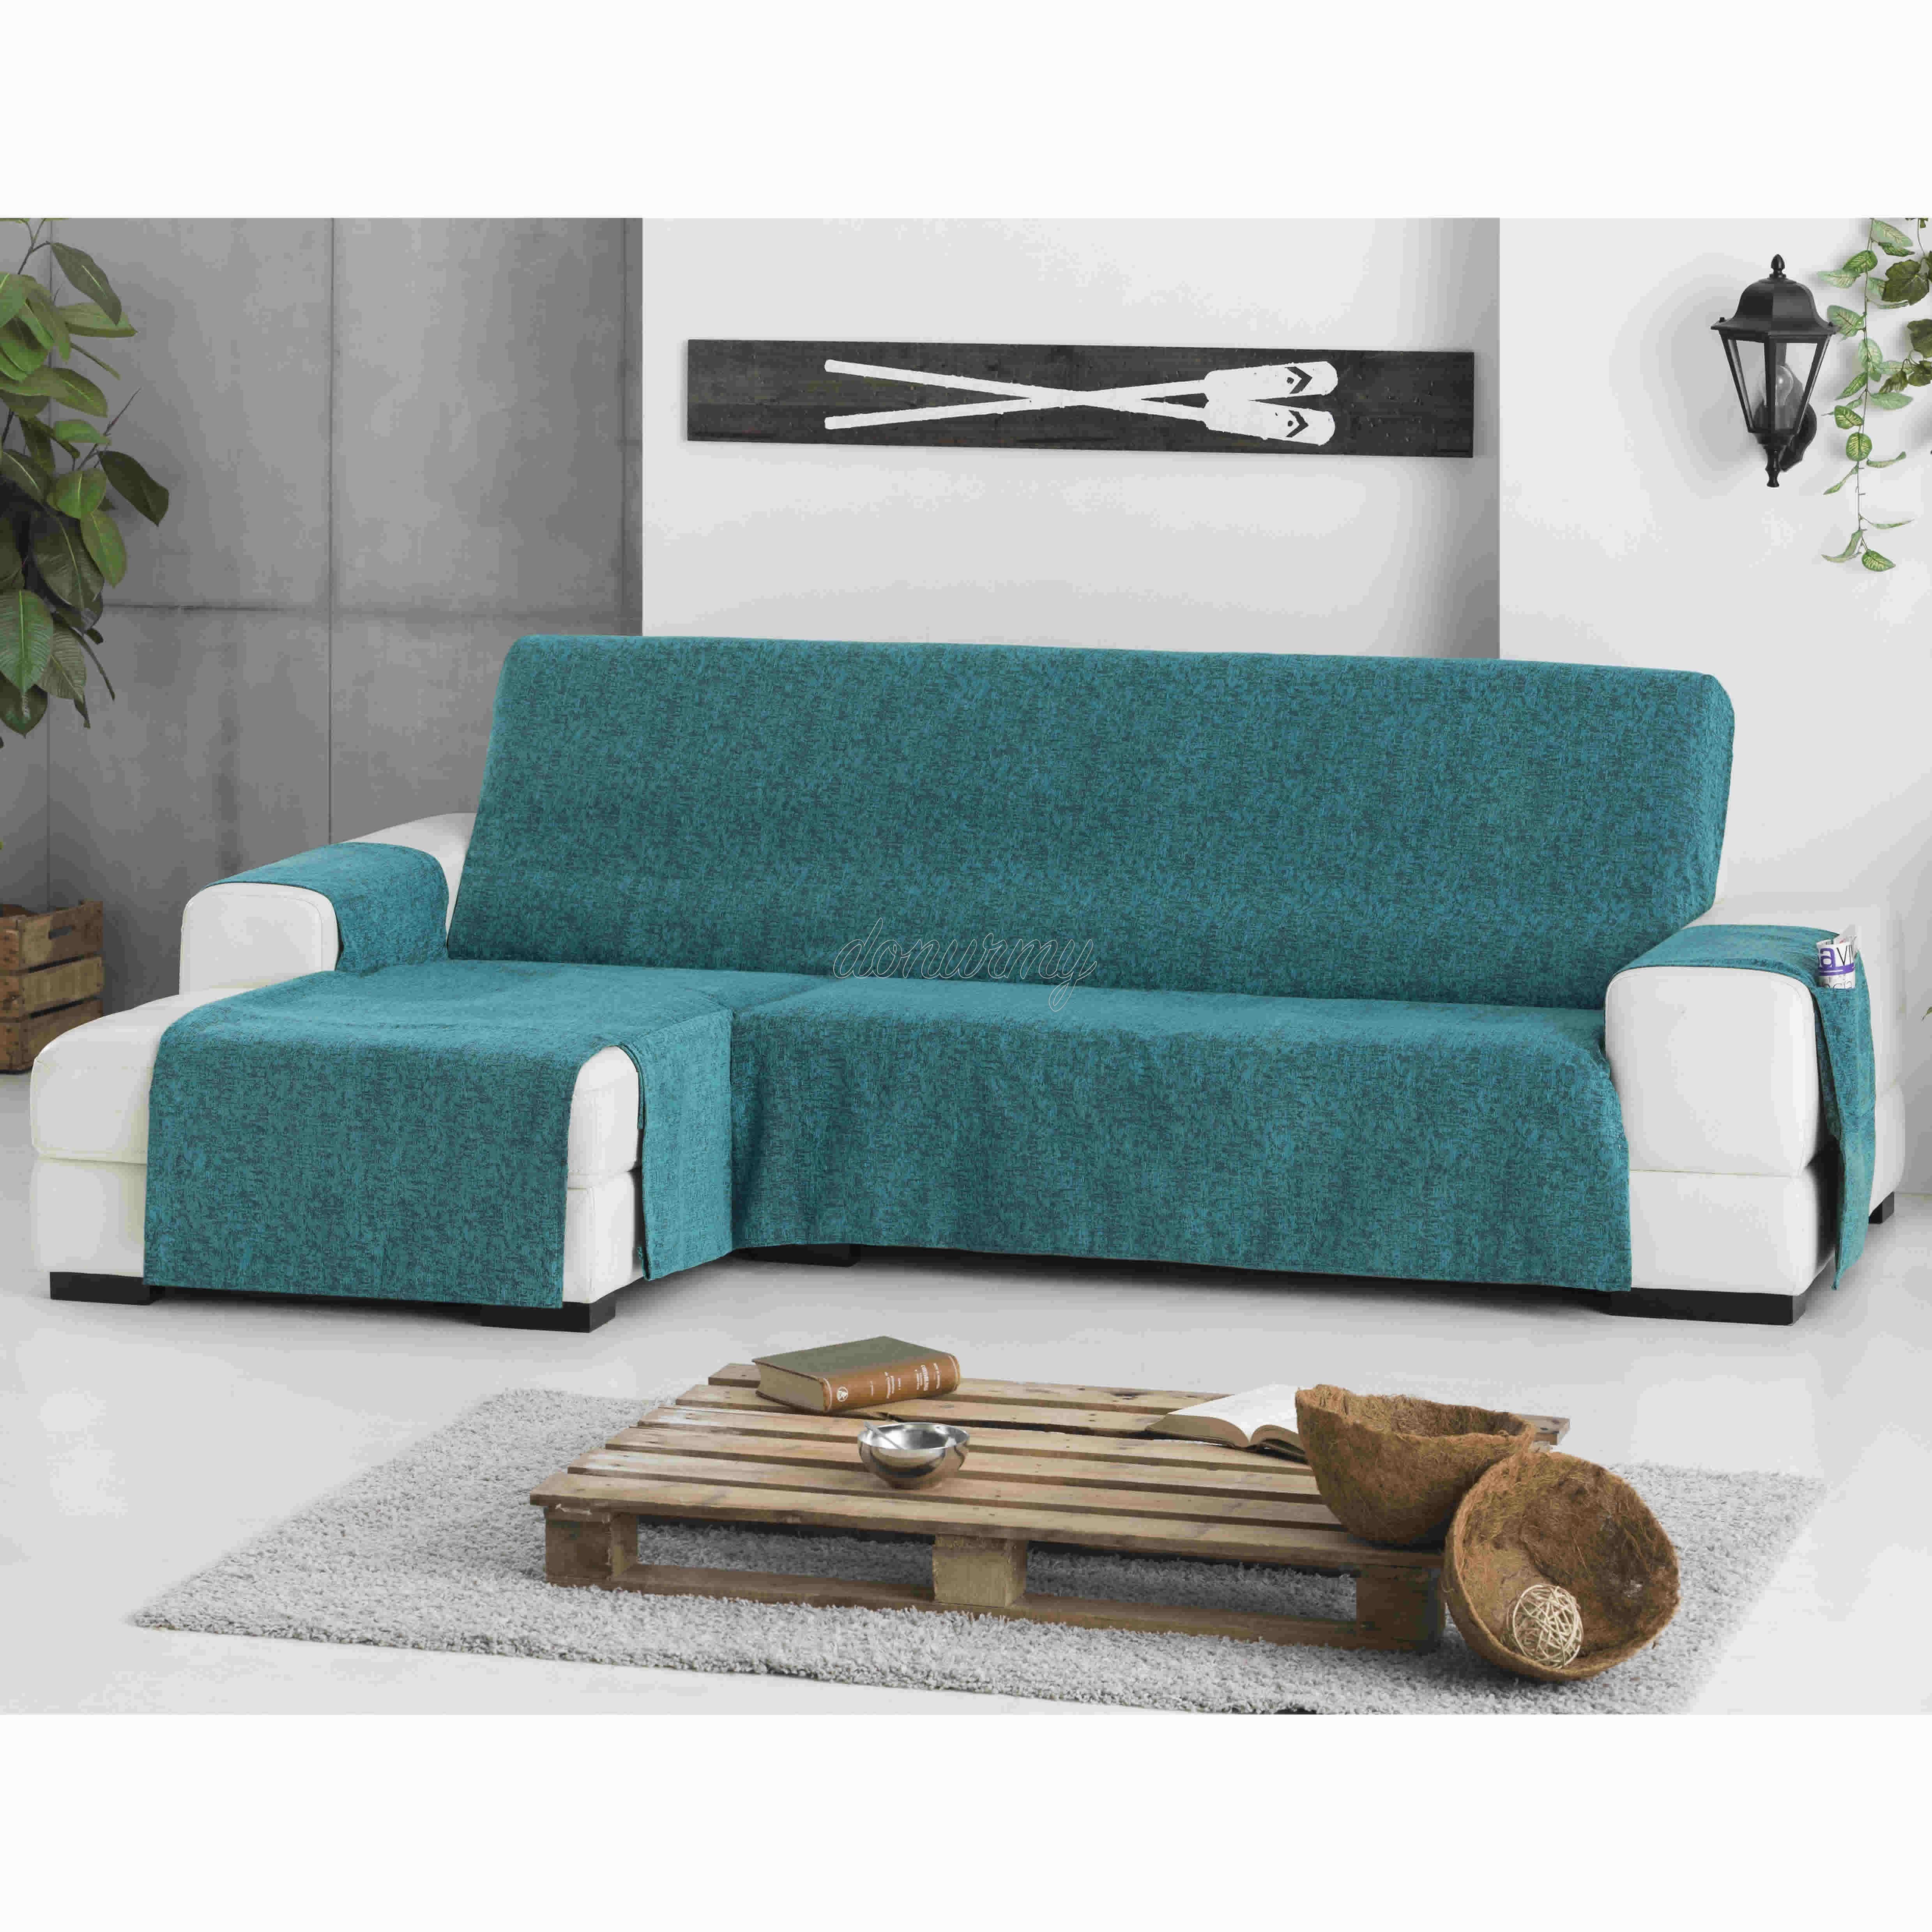 Funda Sofá Práctica Chaise Longue Dream | Funda sofa chaise